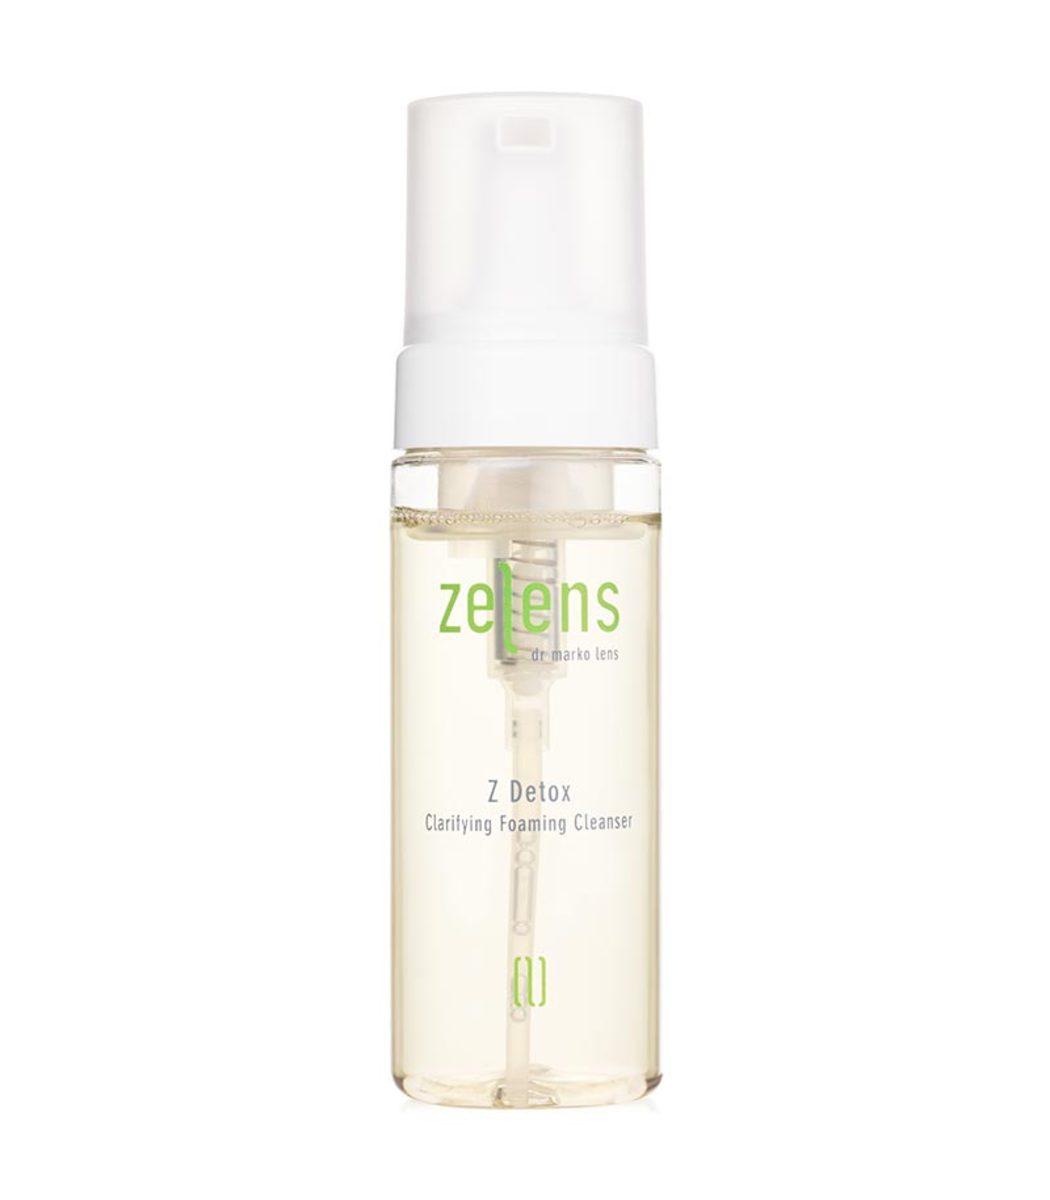 ZELENS Z-Detox Clarifying Foaming Cleanser